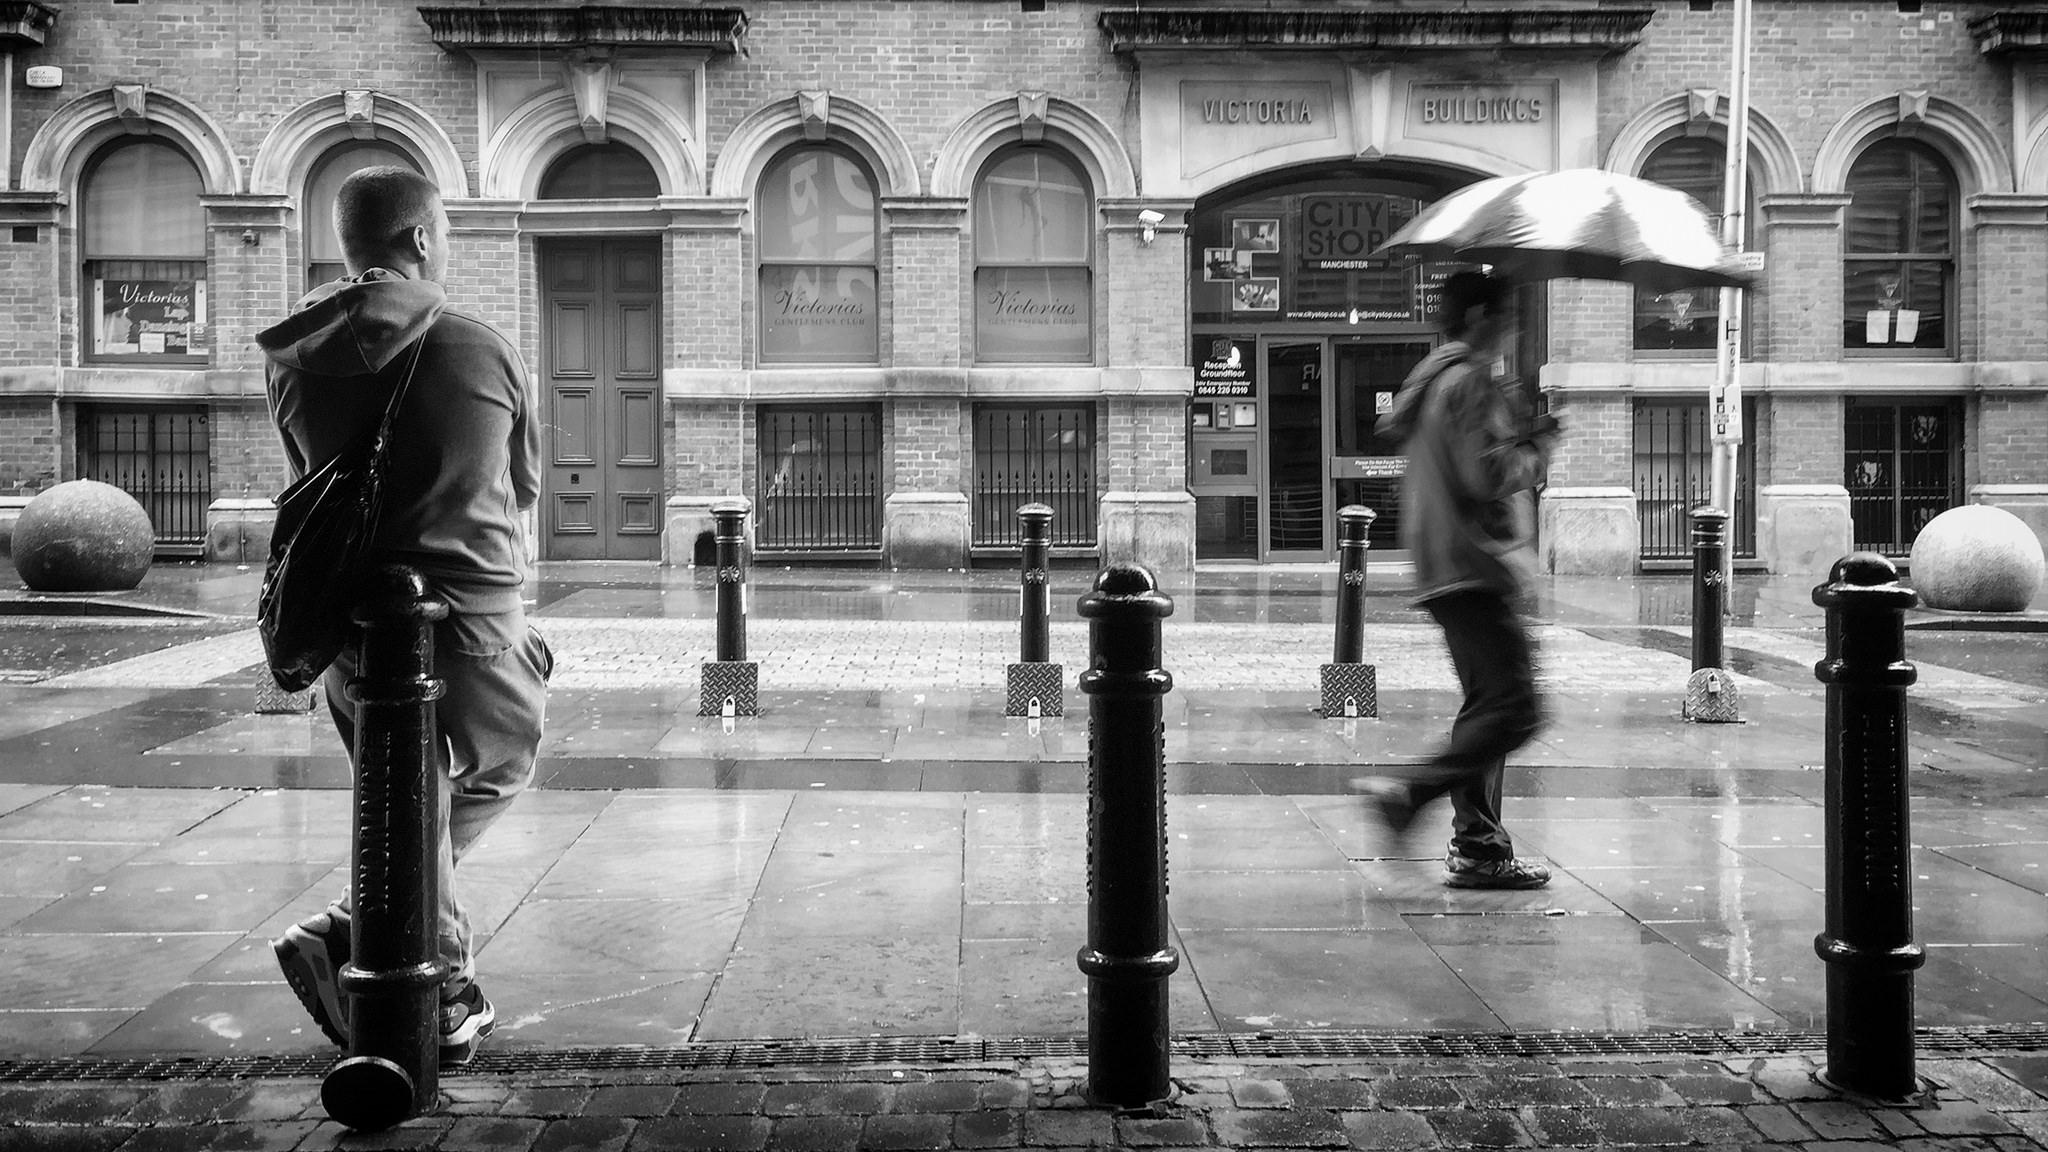 Manchester Rain